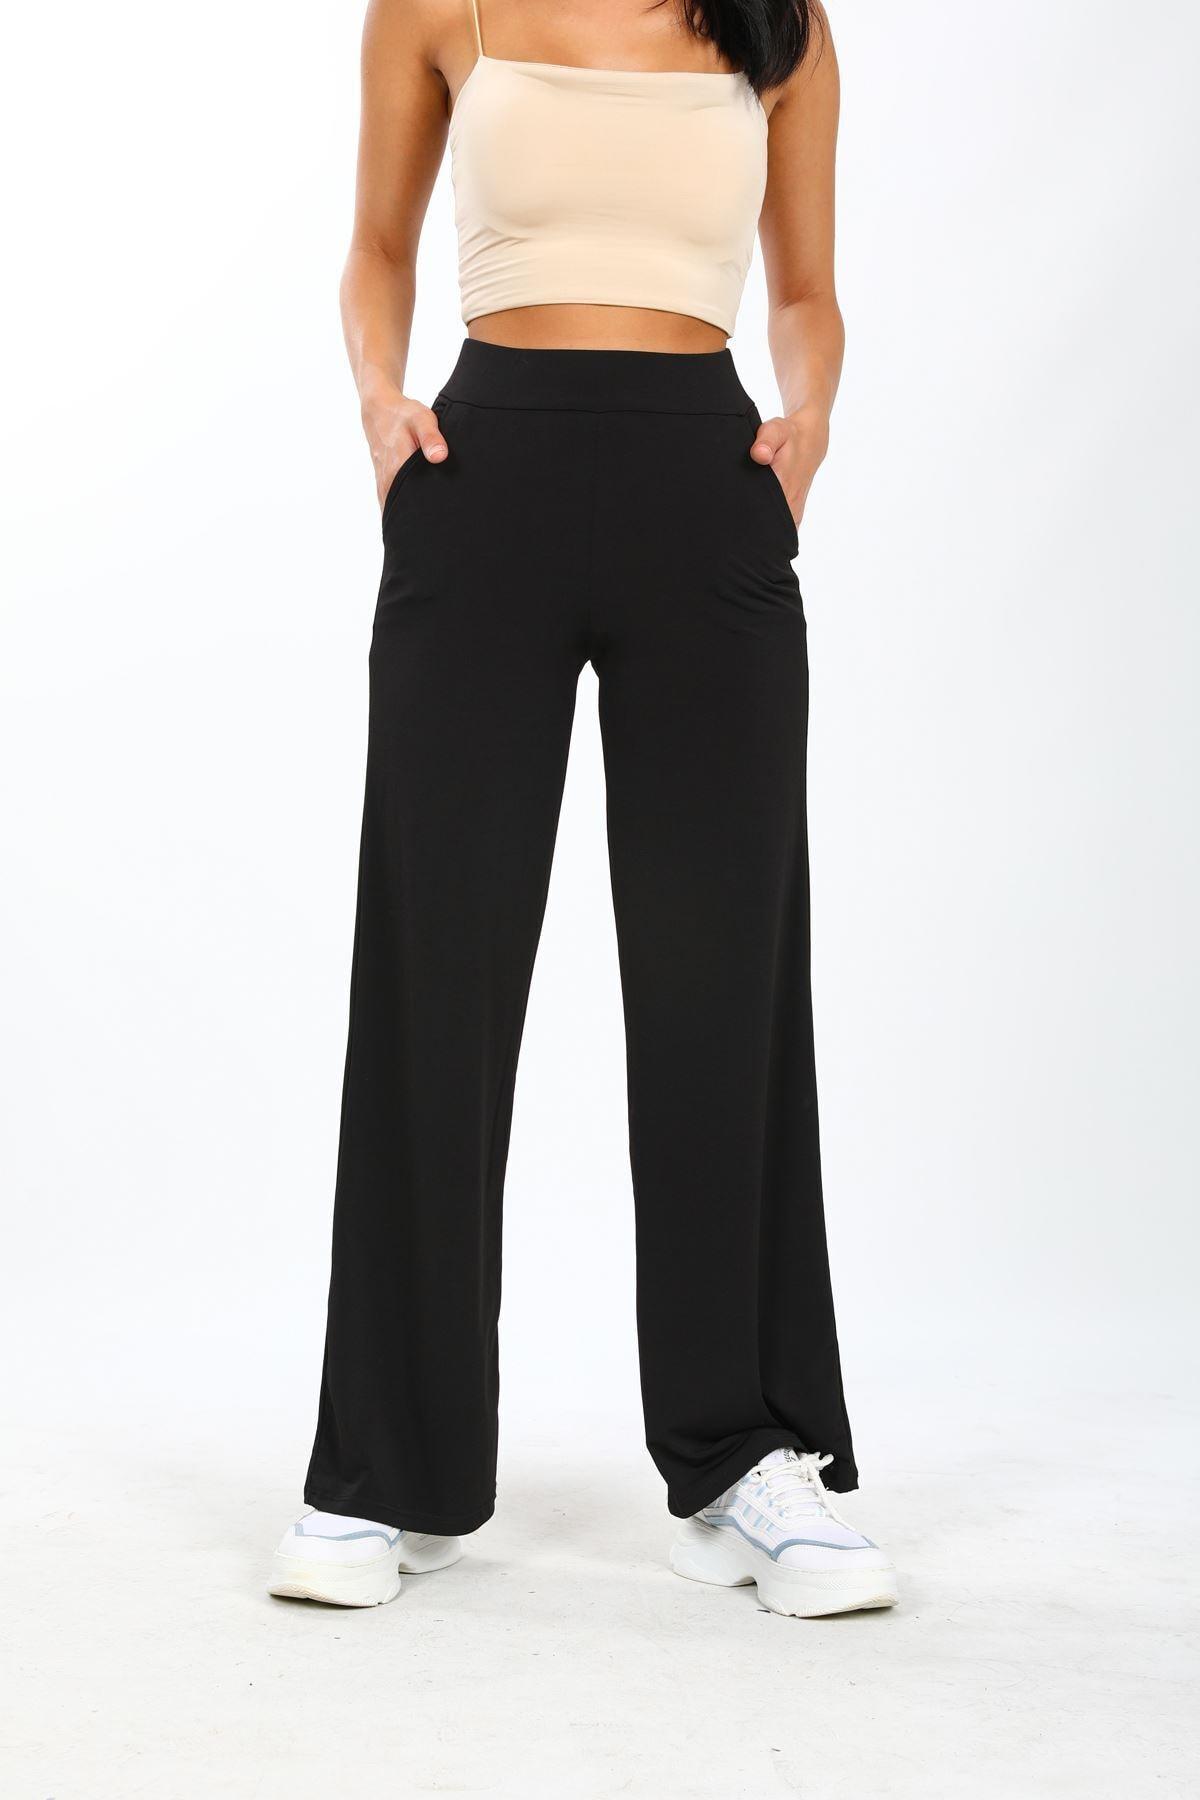 No77 Collection Siyah Sandy Kumaş Belden Lastikli Ve Bol Paça Dökümlü Pantolon 1